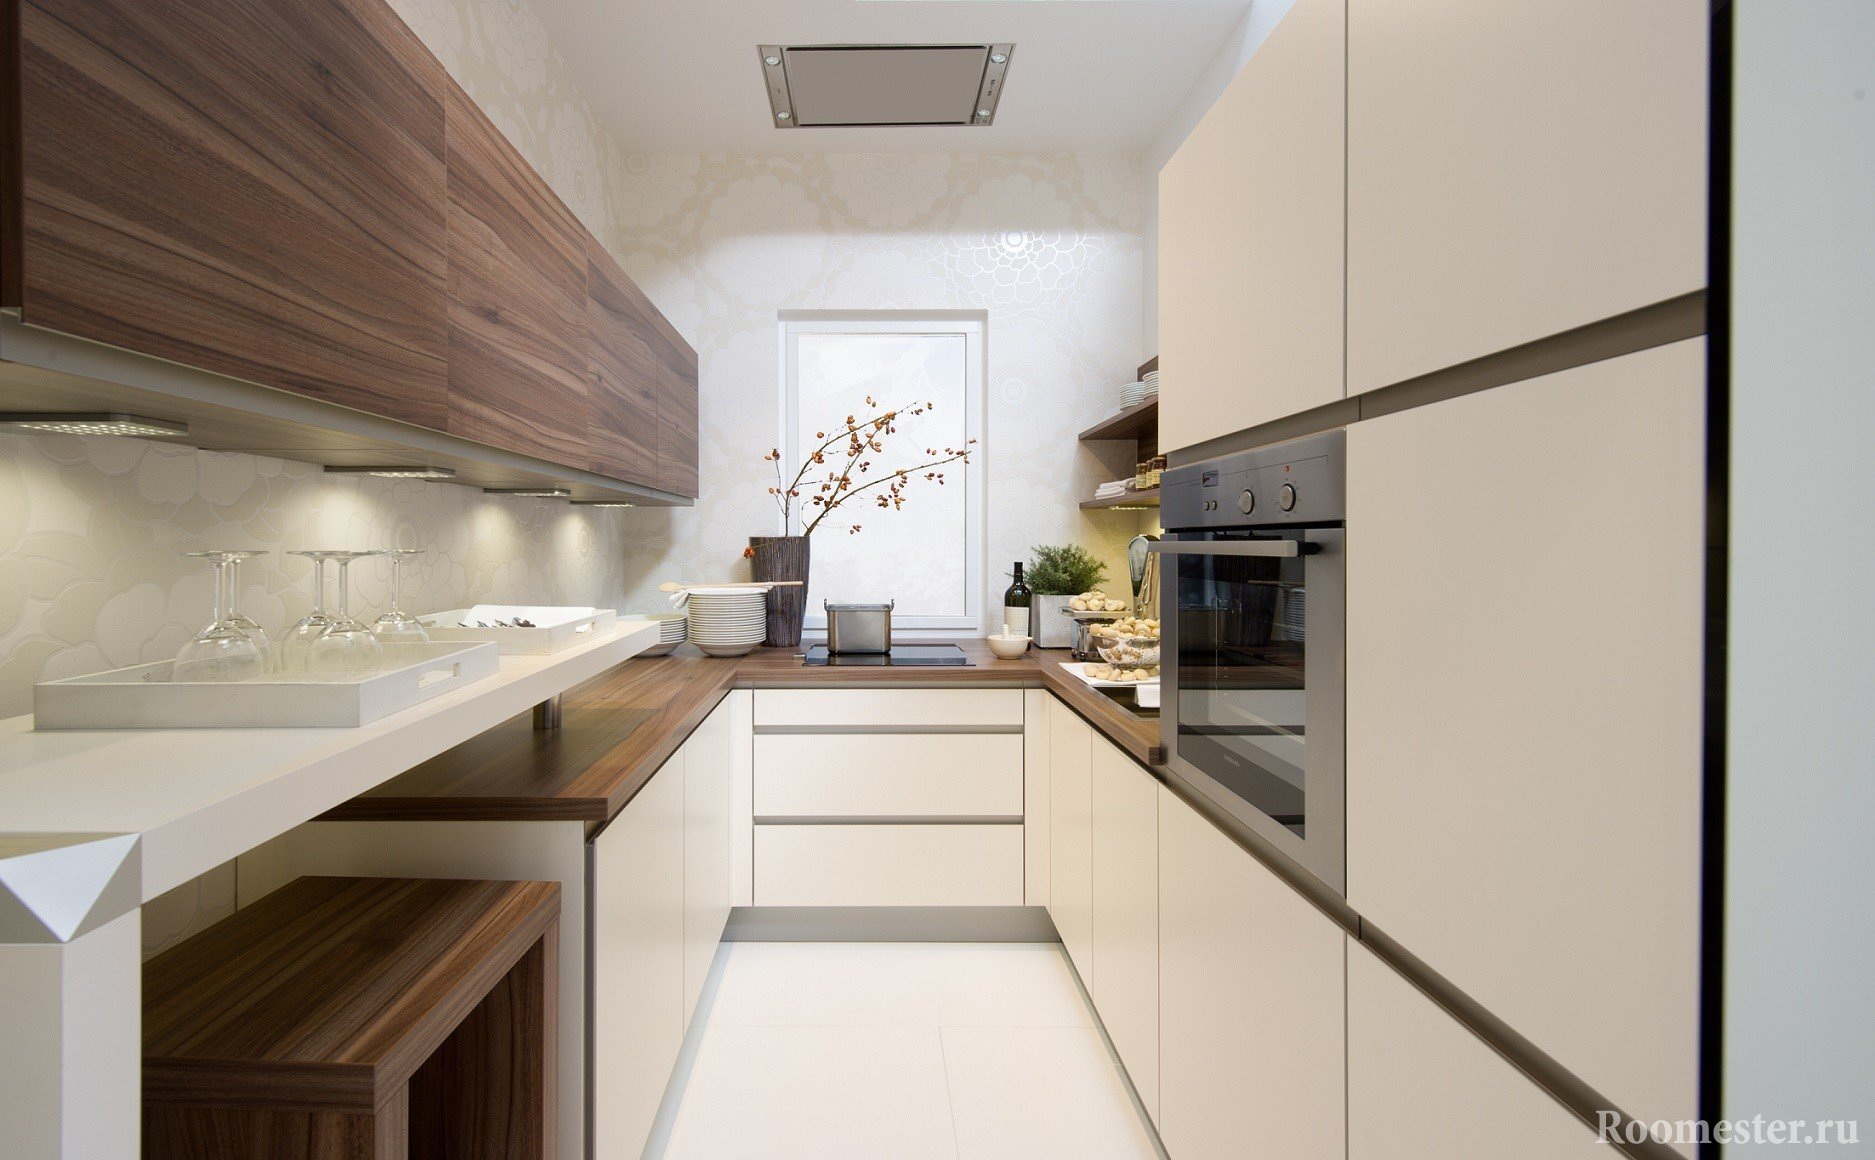 Кухня со шкафом для посуды